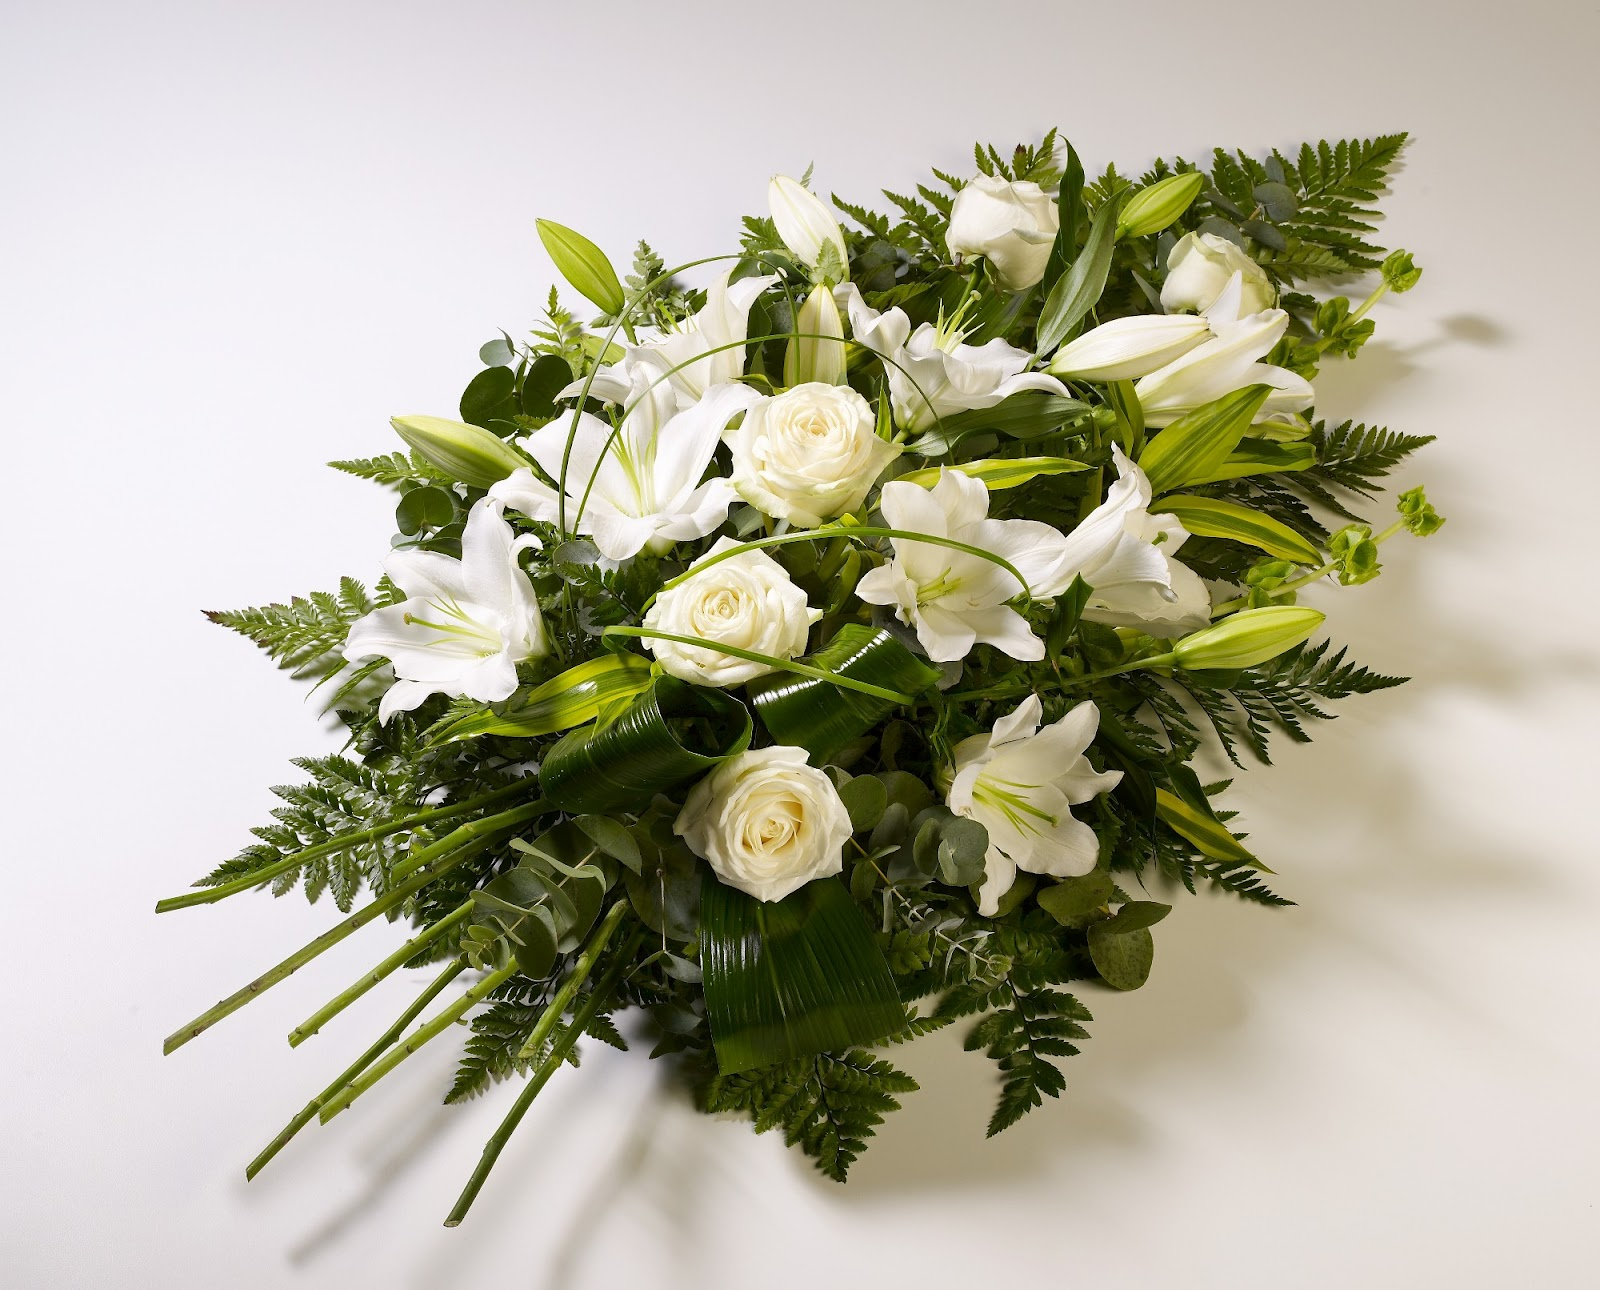 white tied sheaf funeral tribute.jpg